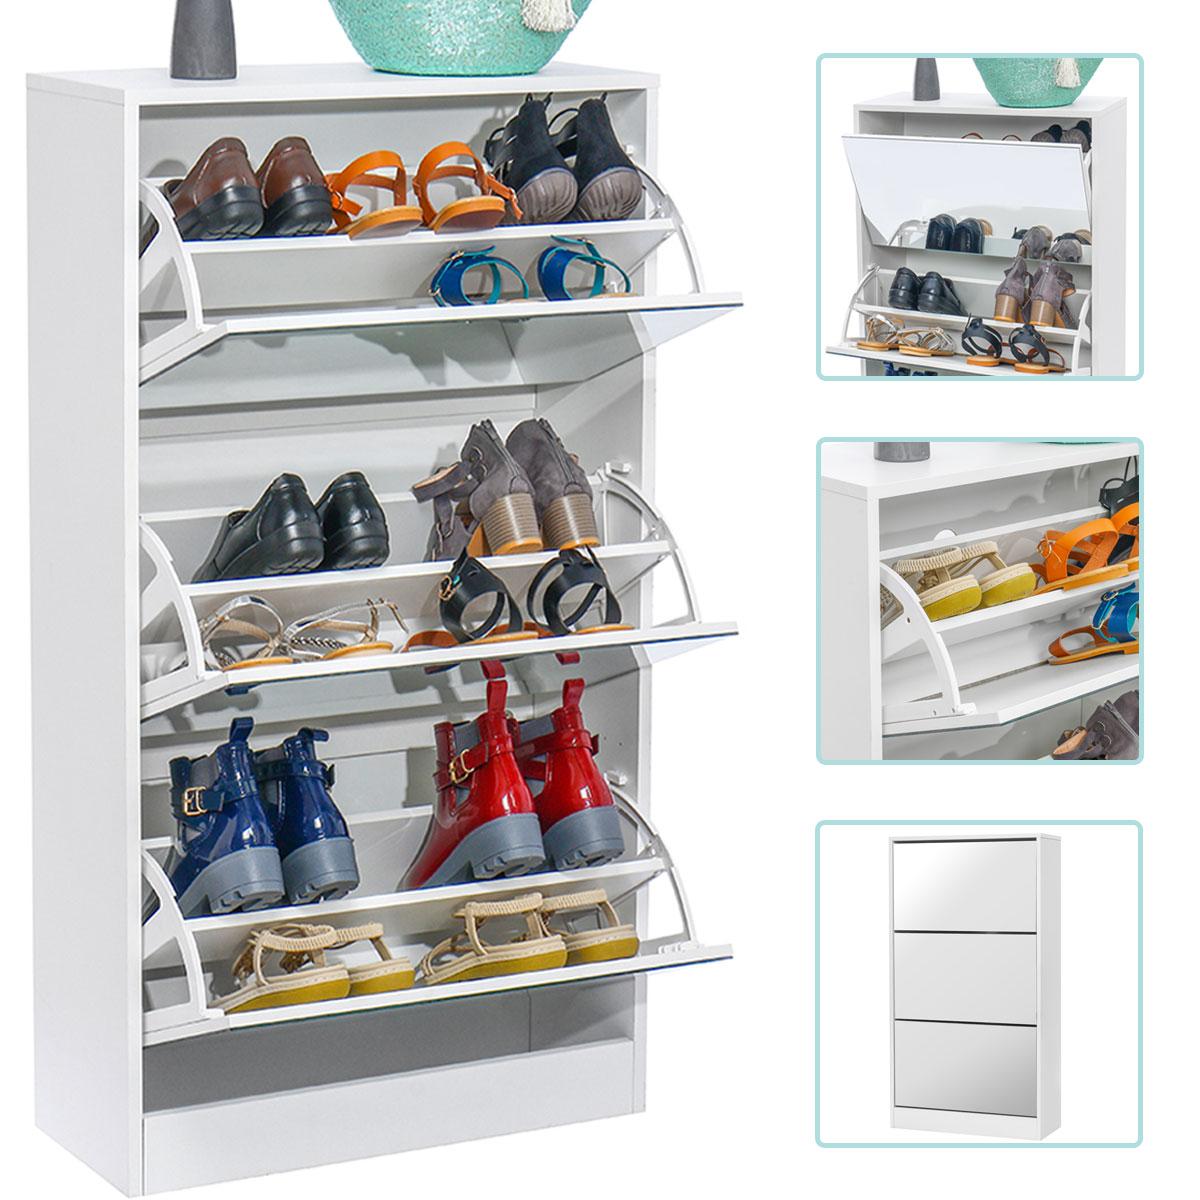 Flip Bucket Shoe Simple Home Space Multi-Layer Door Dustproof Porch Solid Wood Shoe Rack Shoes Cabinet Mirror 24Pairs